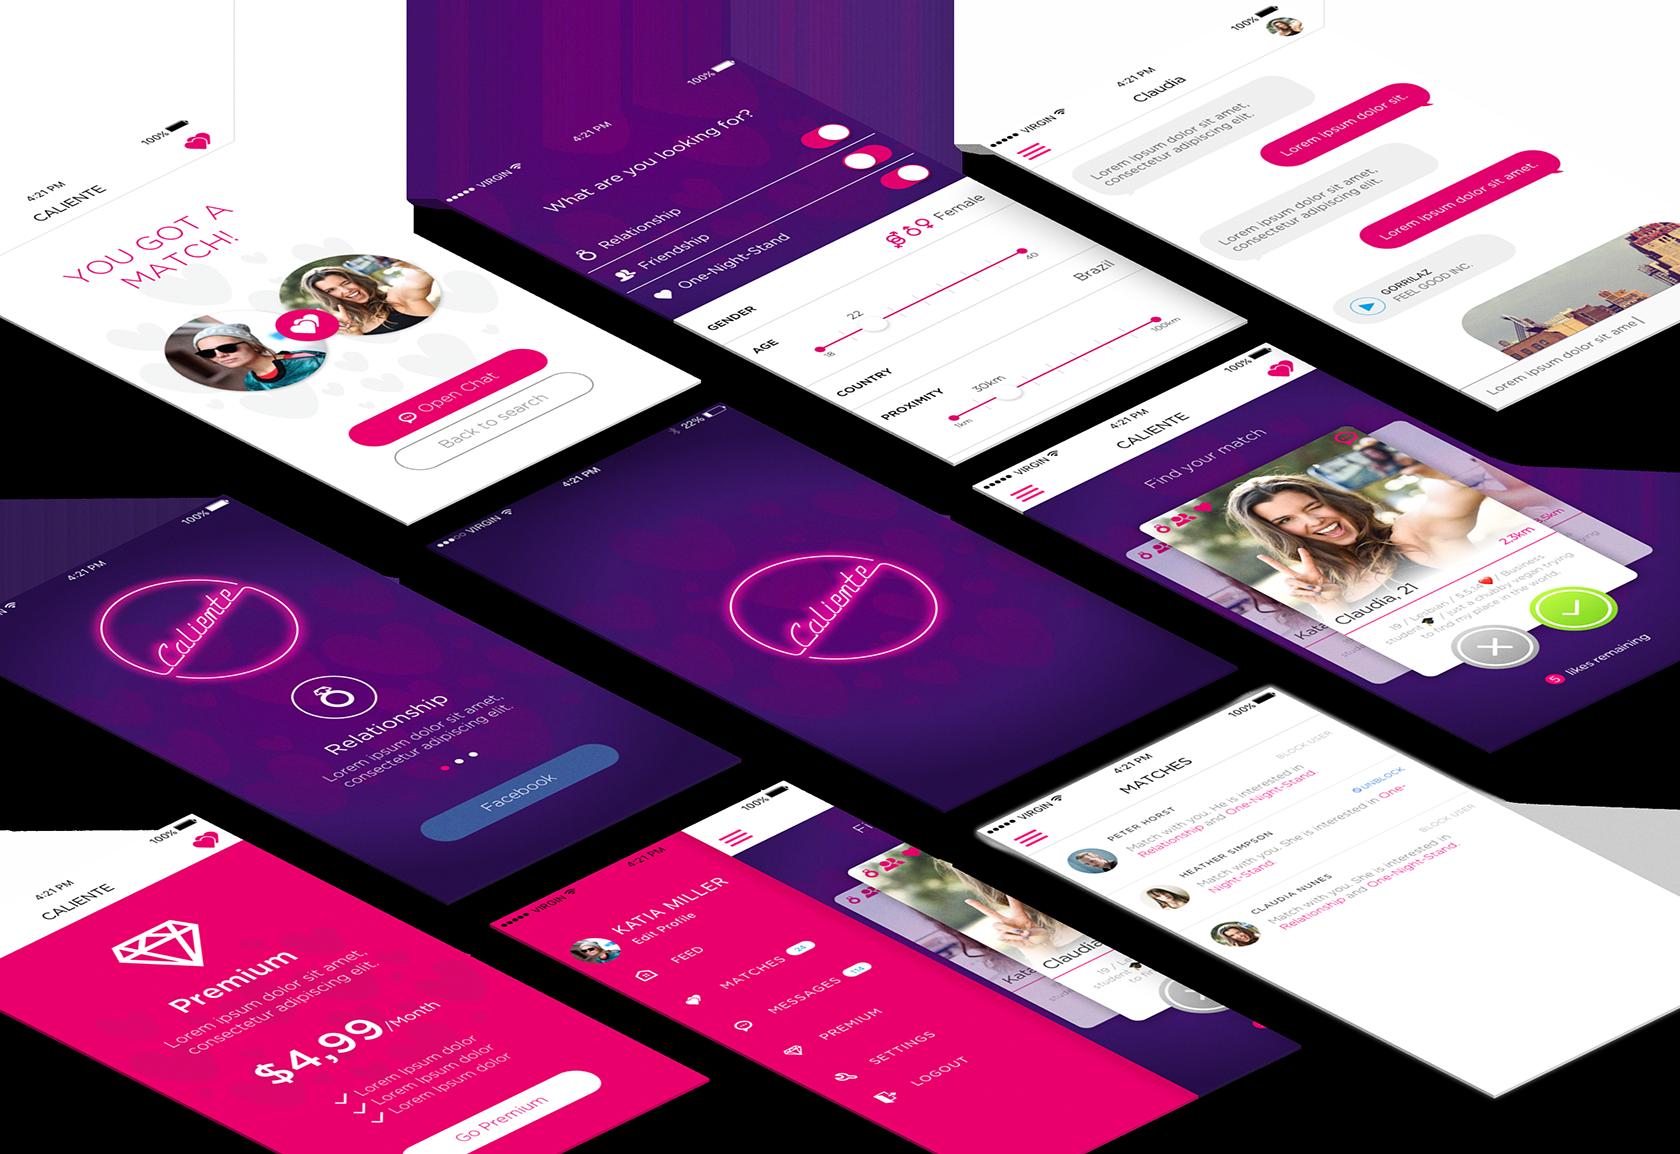 Caliente dating app